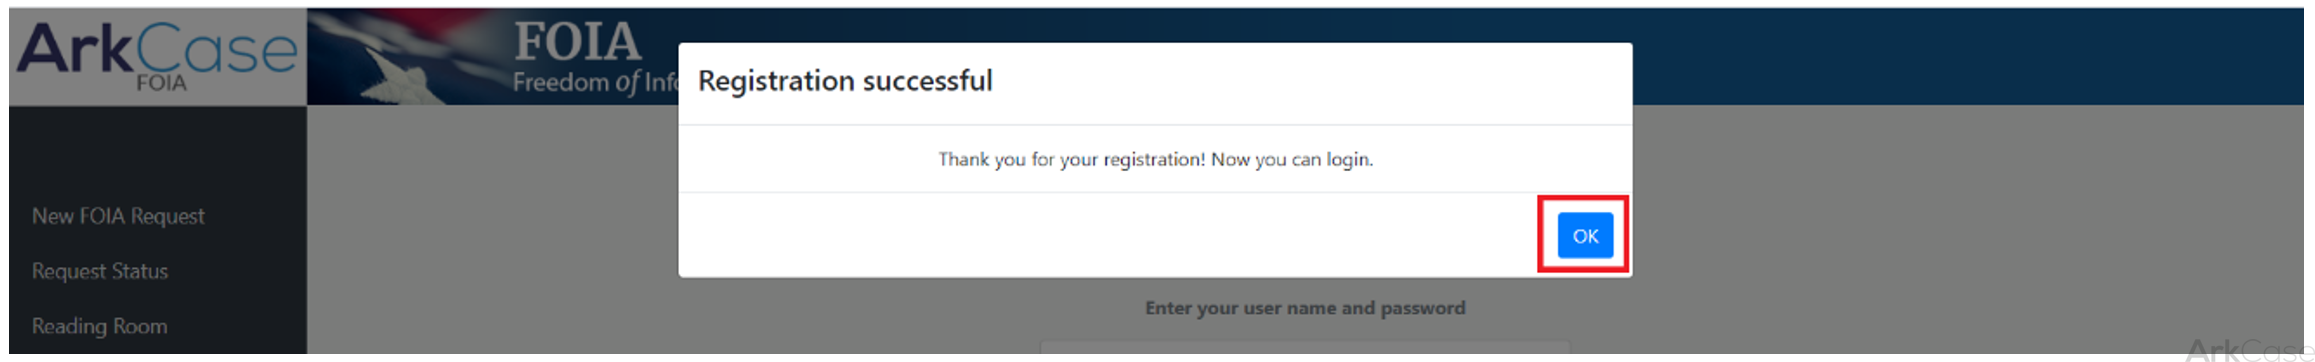 registration successful message